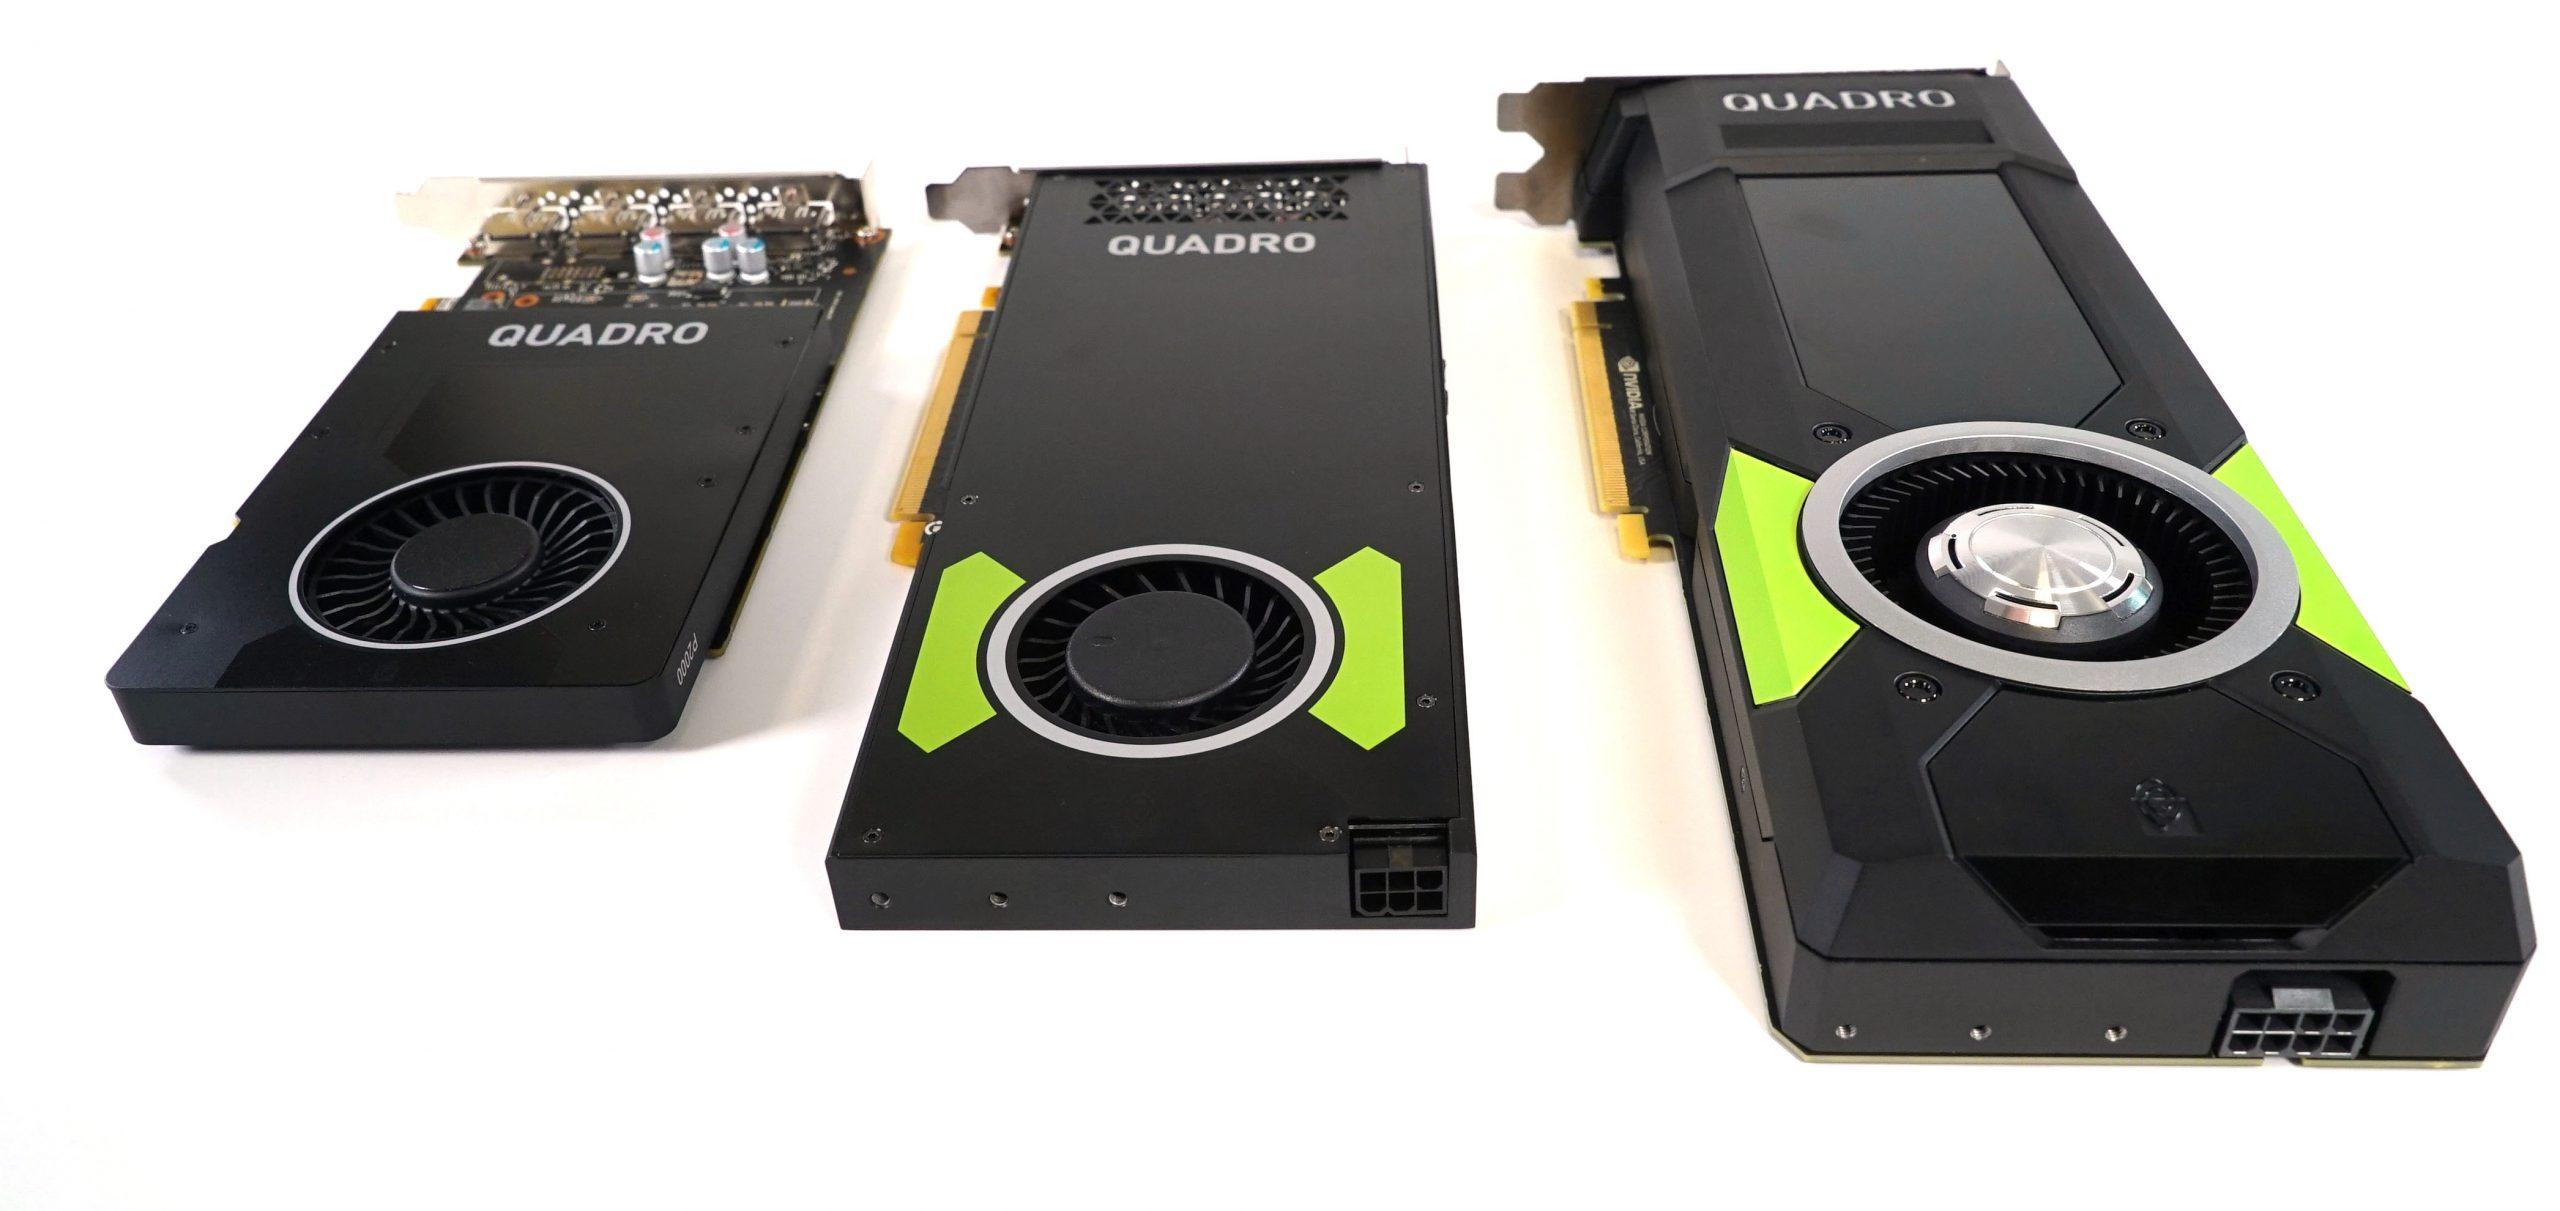 NVIDIA Pascal Quadro Roundup – P2000, P3000, P5000 Tested